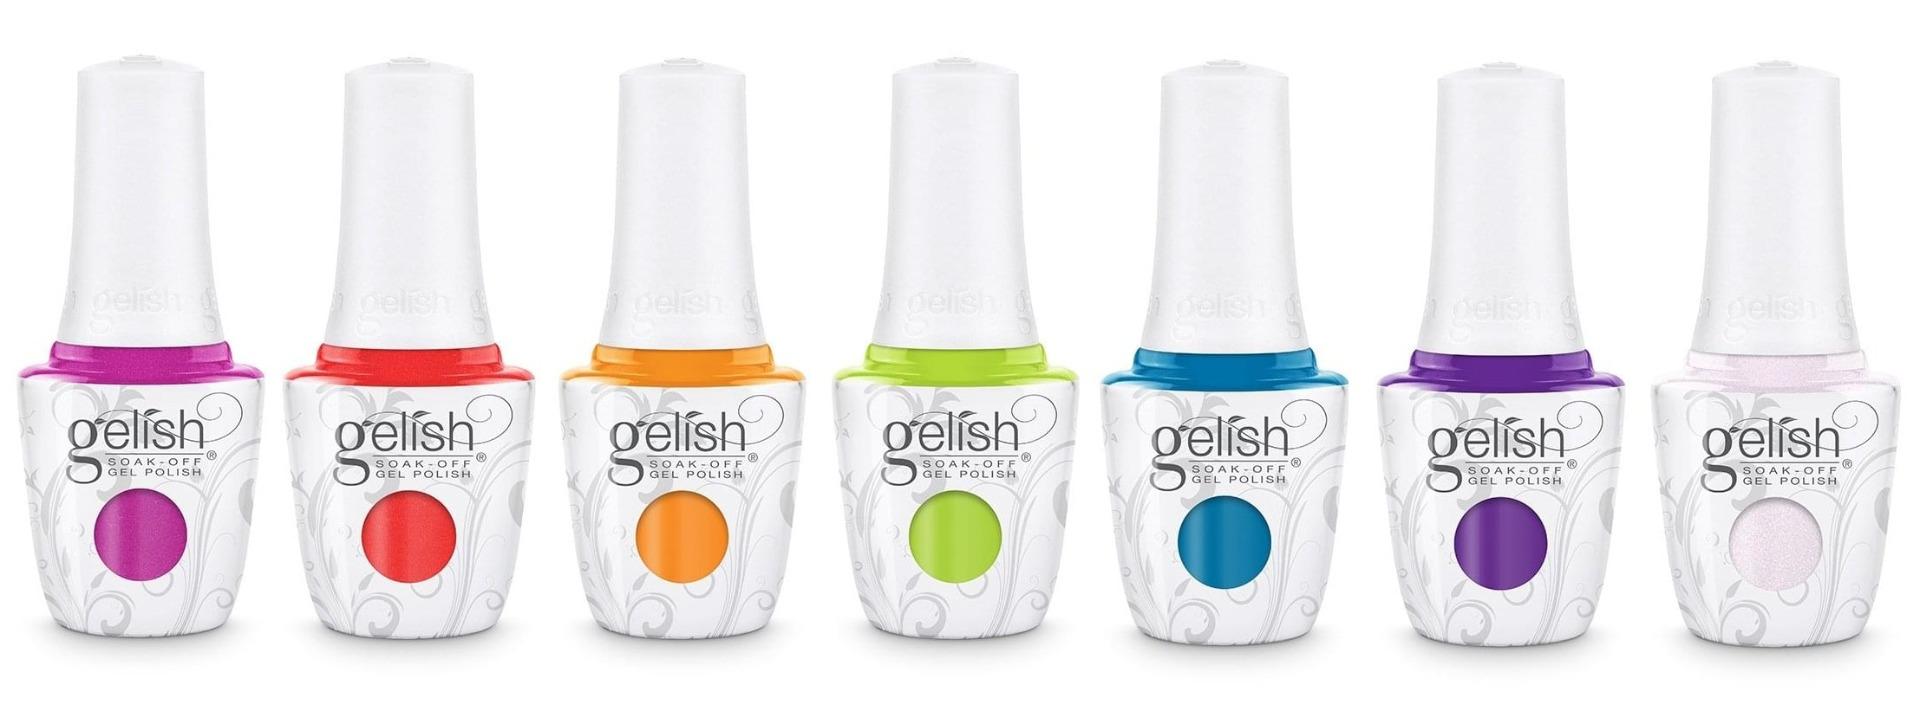 Gelish Make a Splash